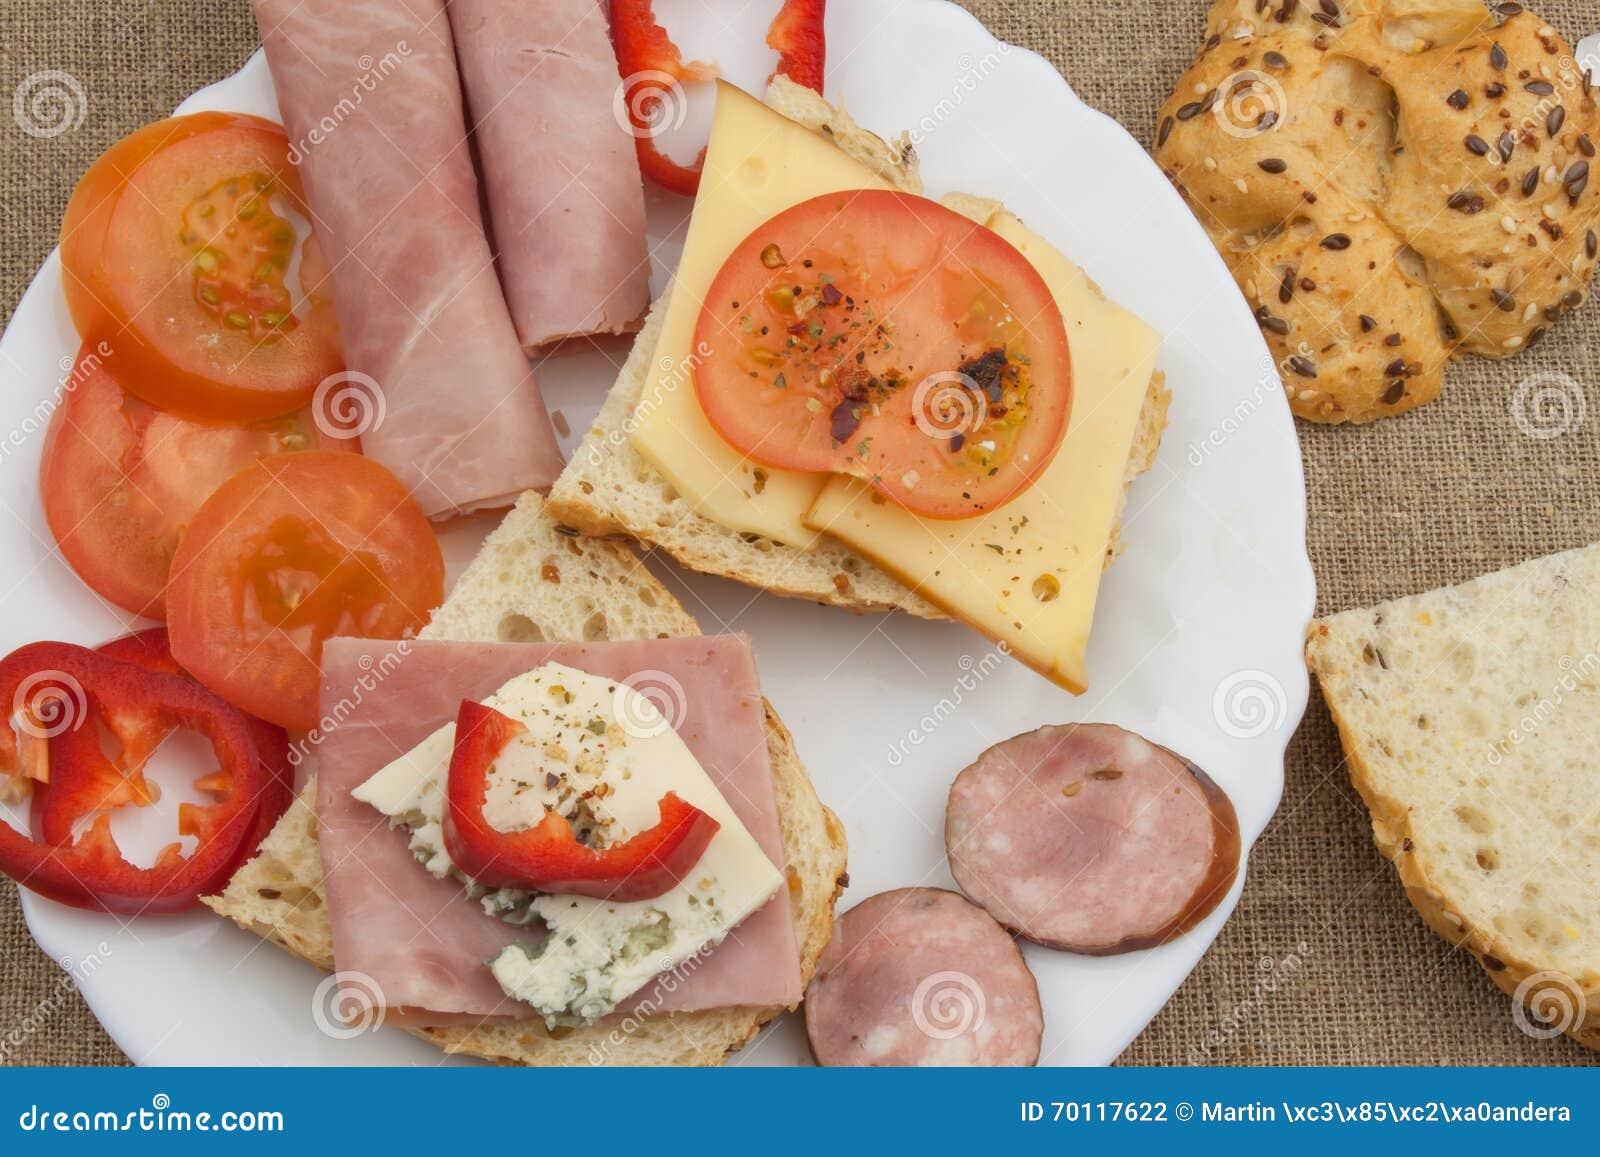 recipe: ham for breakfast healthy [12]